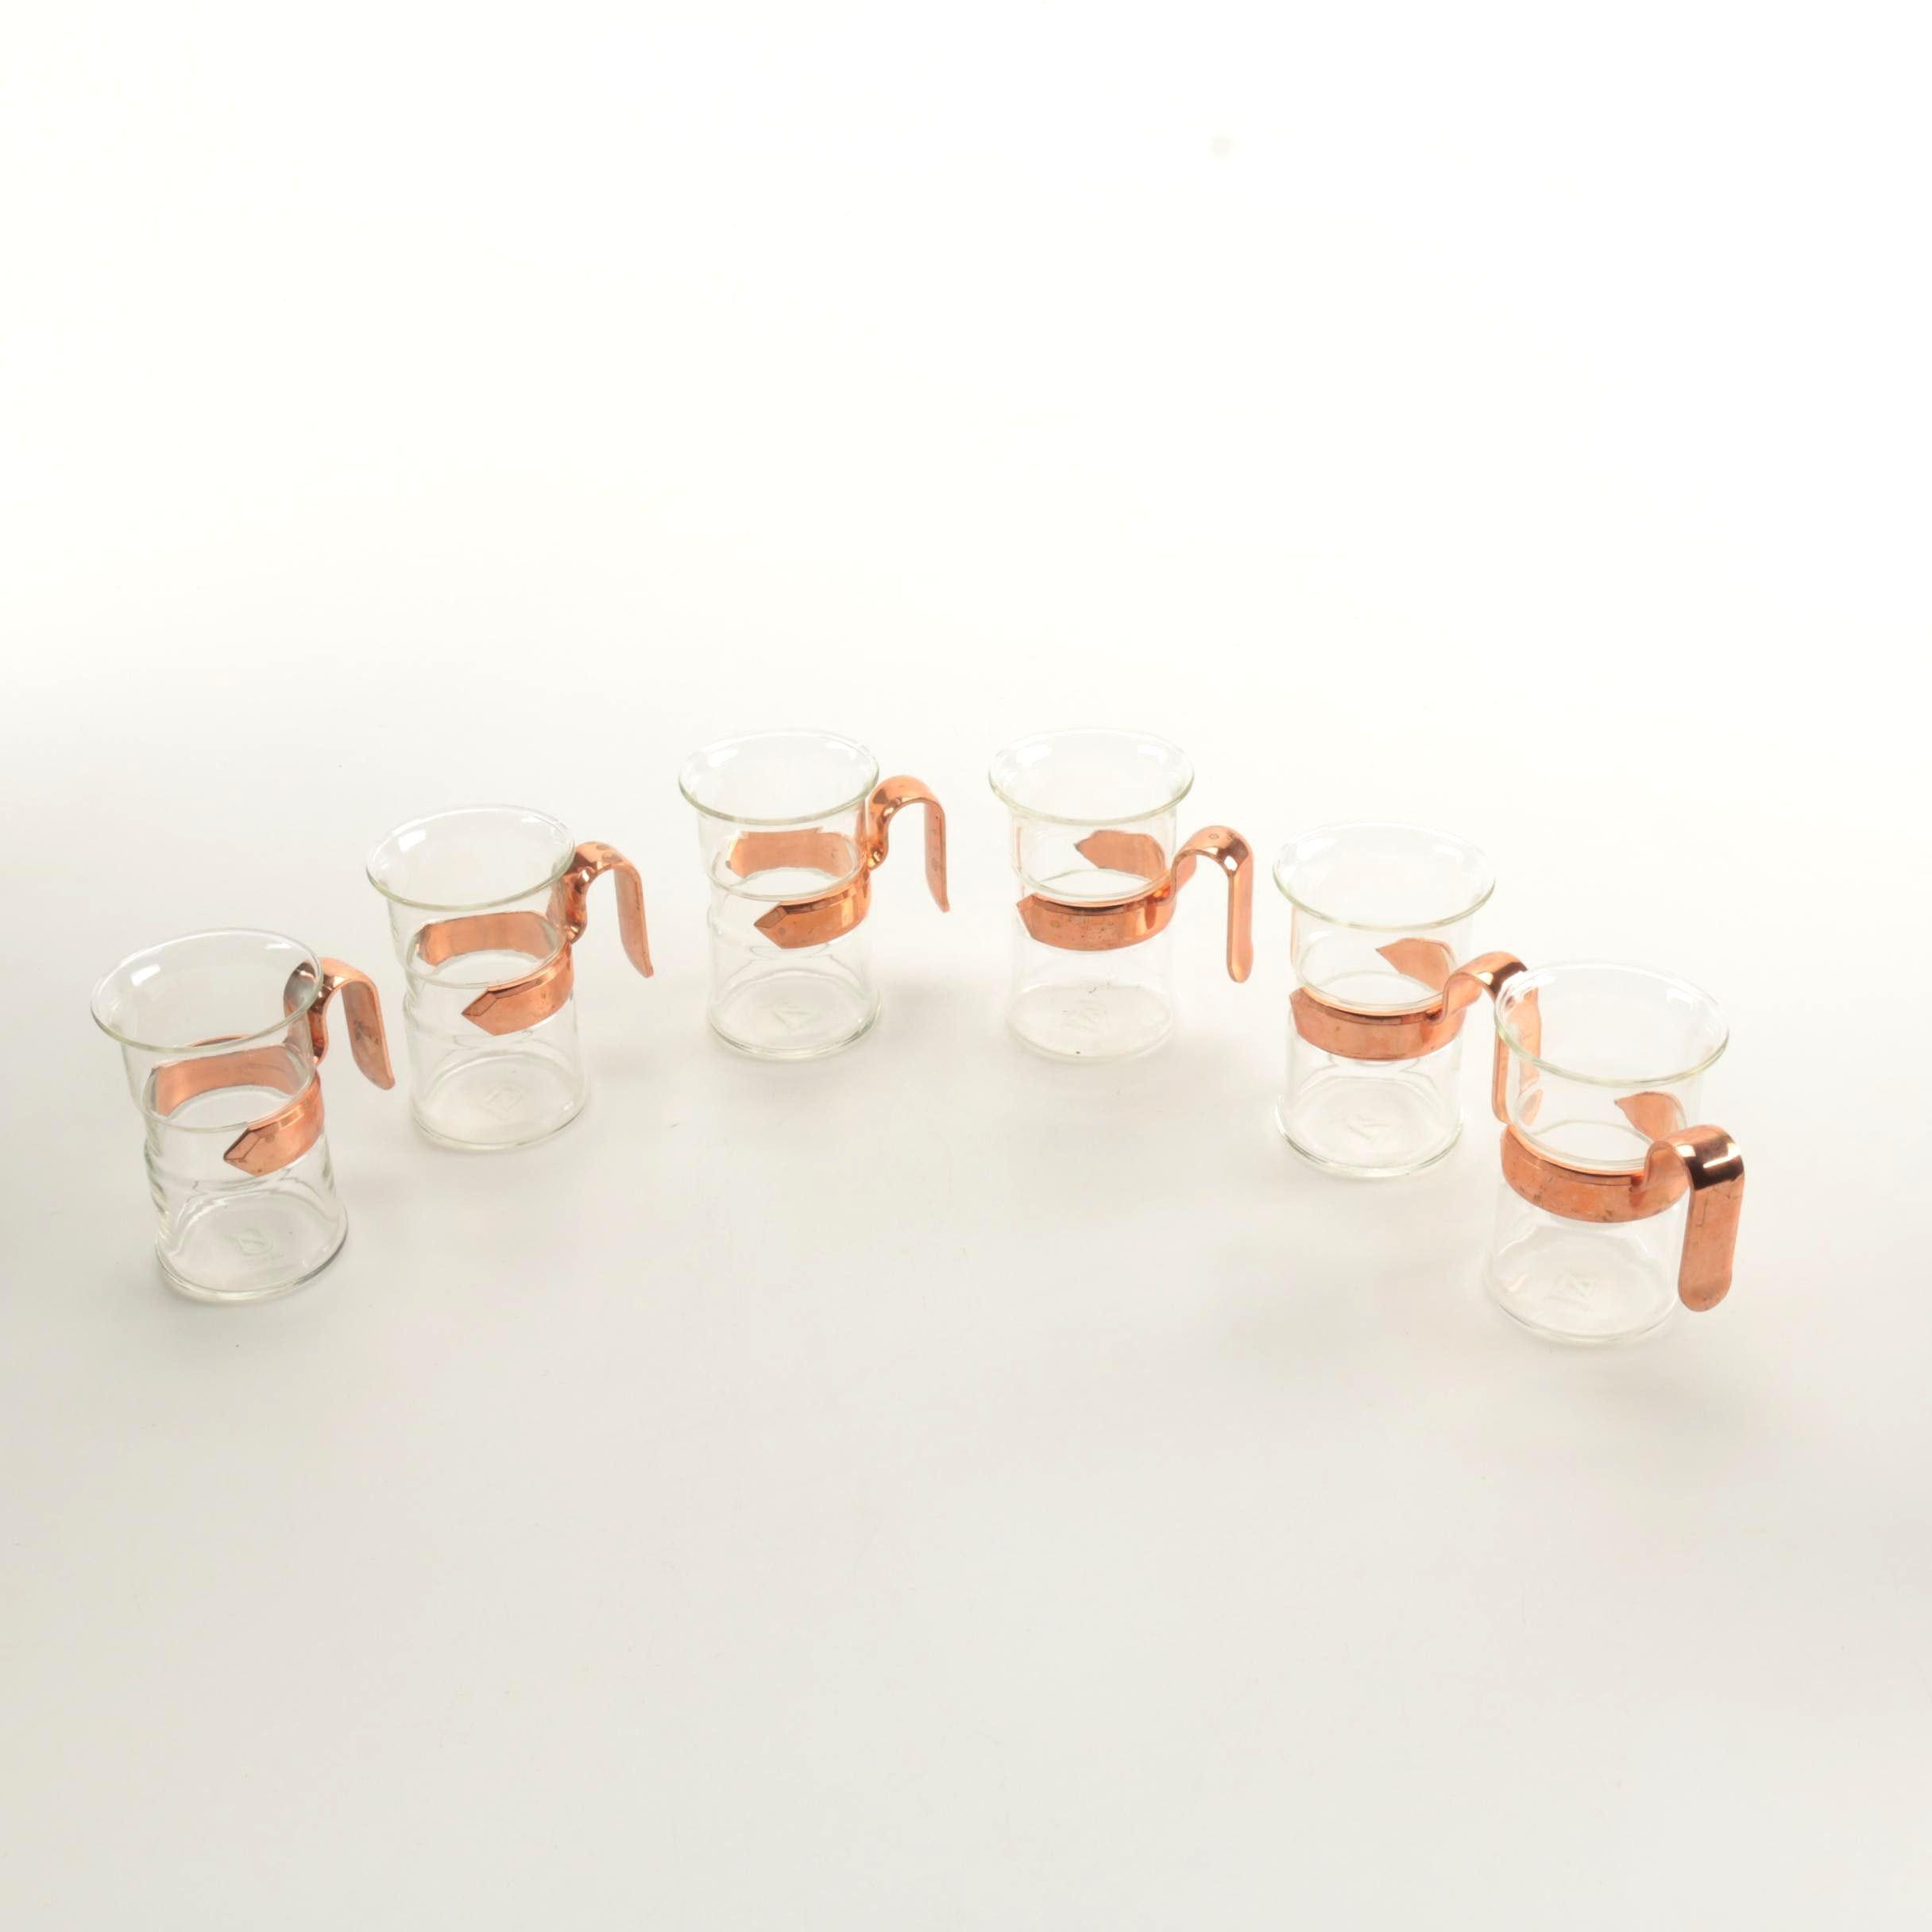 Mid-Century Nilsjohan Glühwein Glasses With Copper Tone Handles